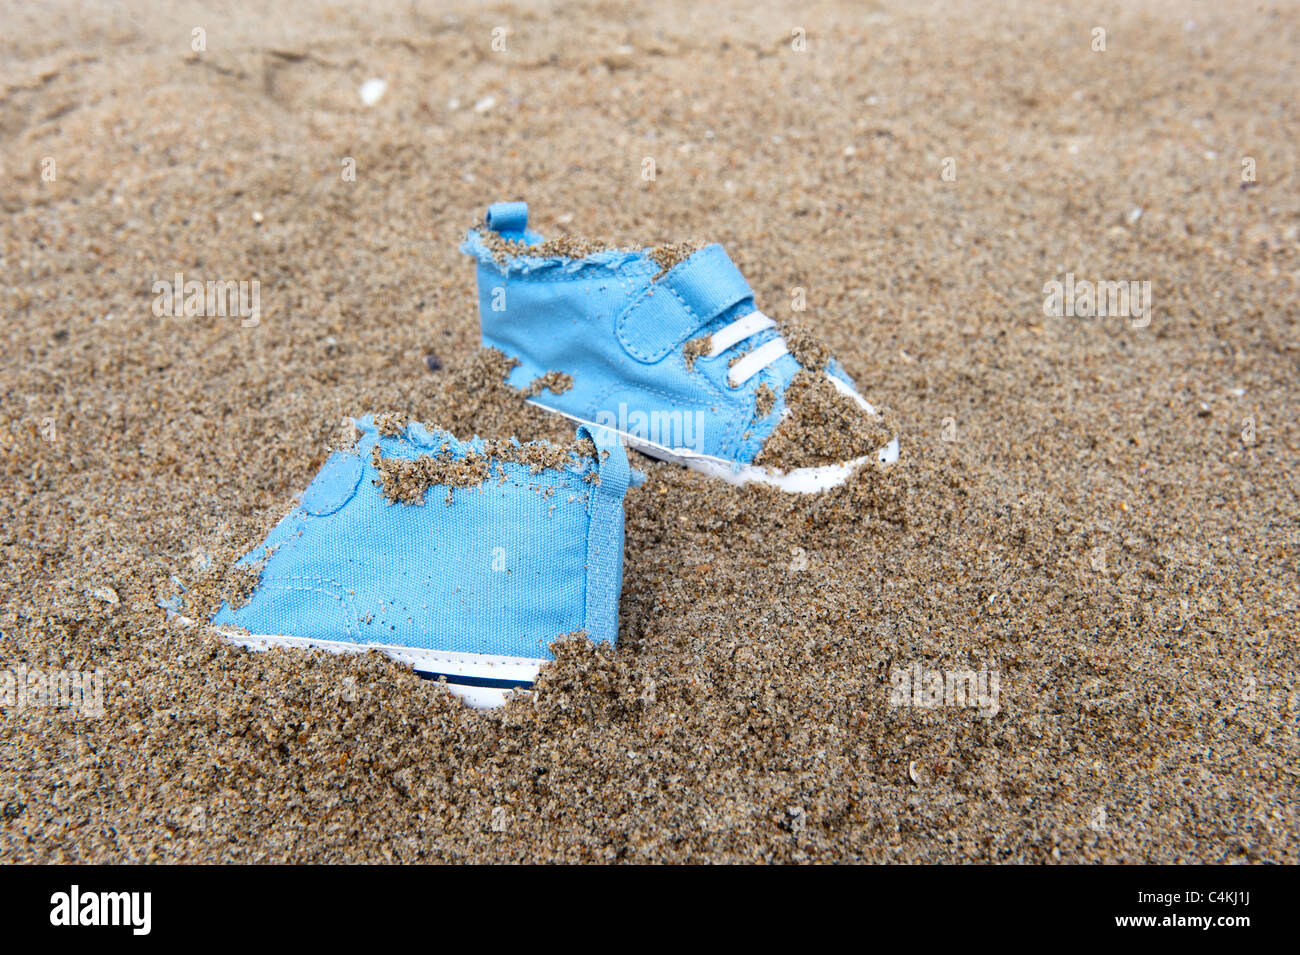 Ein paar Tennisschuhe Baby verloren an einem Sandstrand. Stockbild